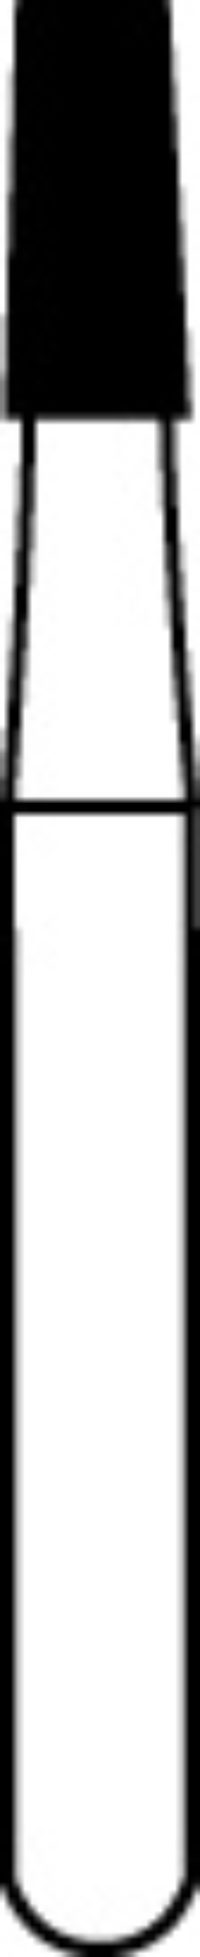 CLOSEOUT SALE: 703 Taper Flat End Carbide